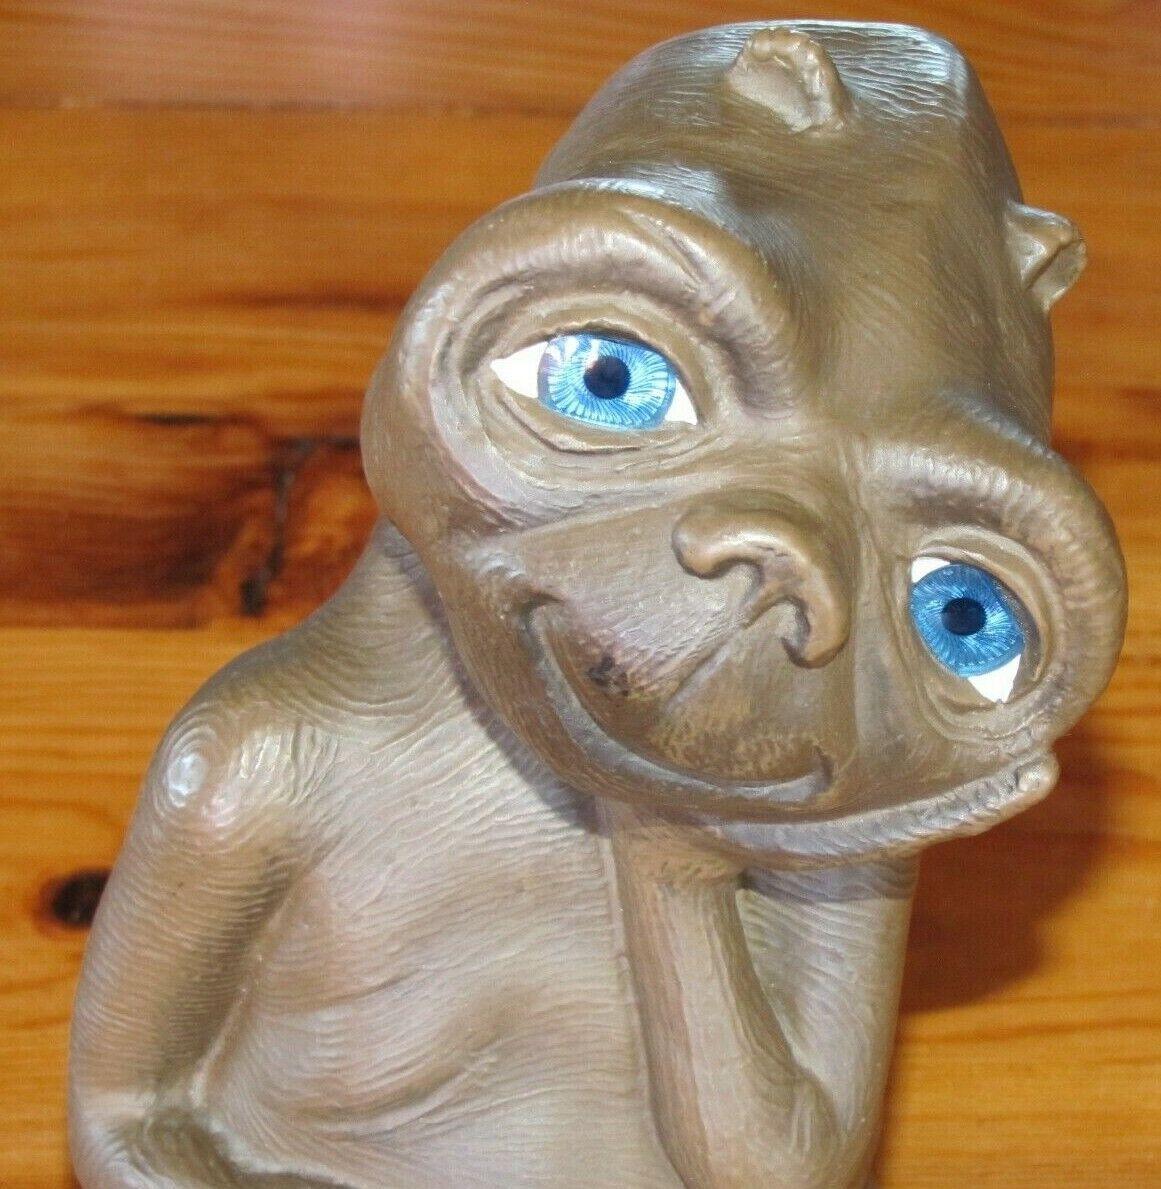 E.t. the extraterrestrial 20 cm figurine vintage rare collector (steven spielberg)